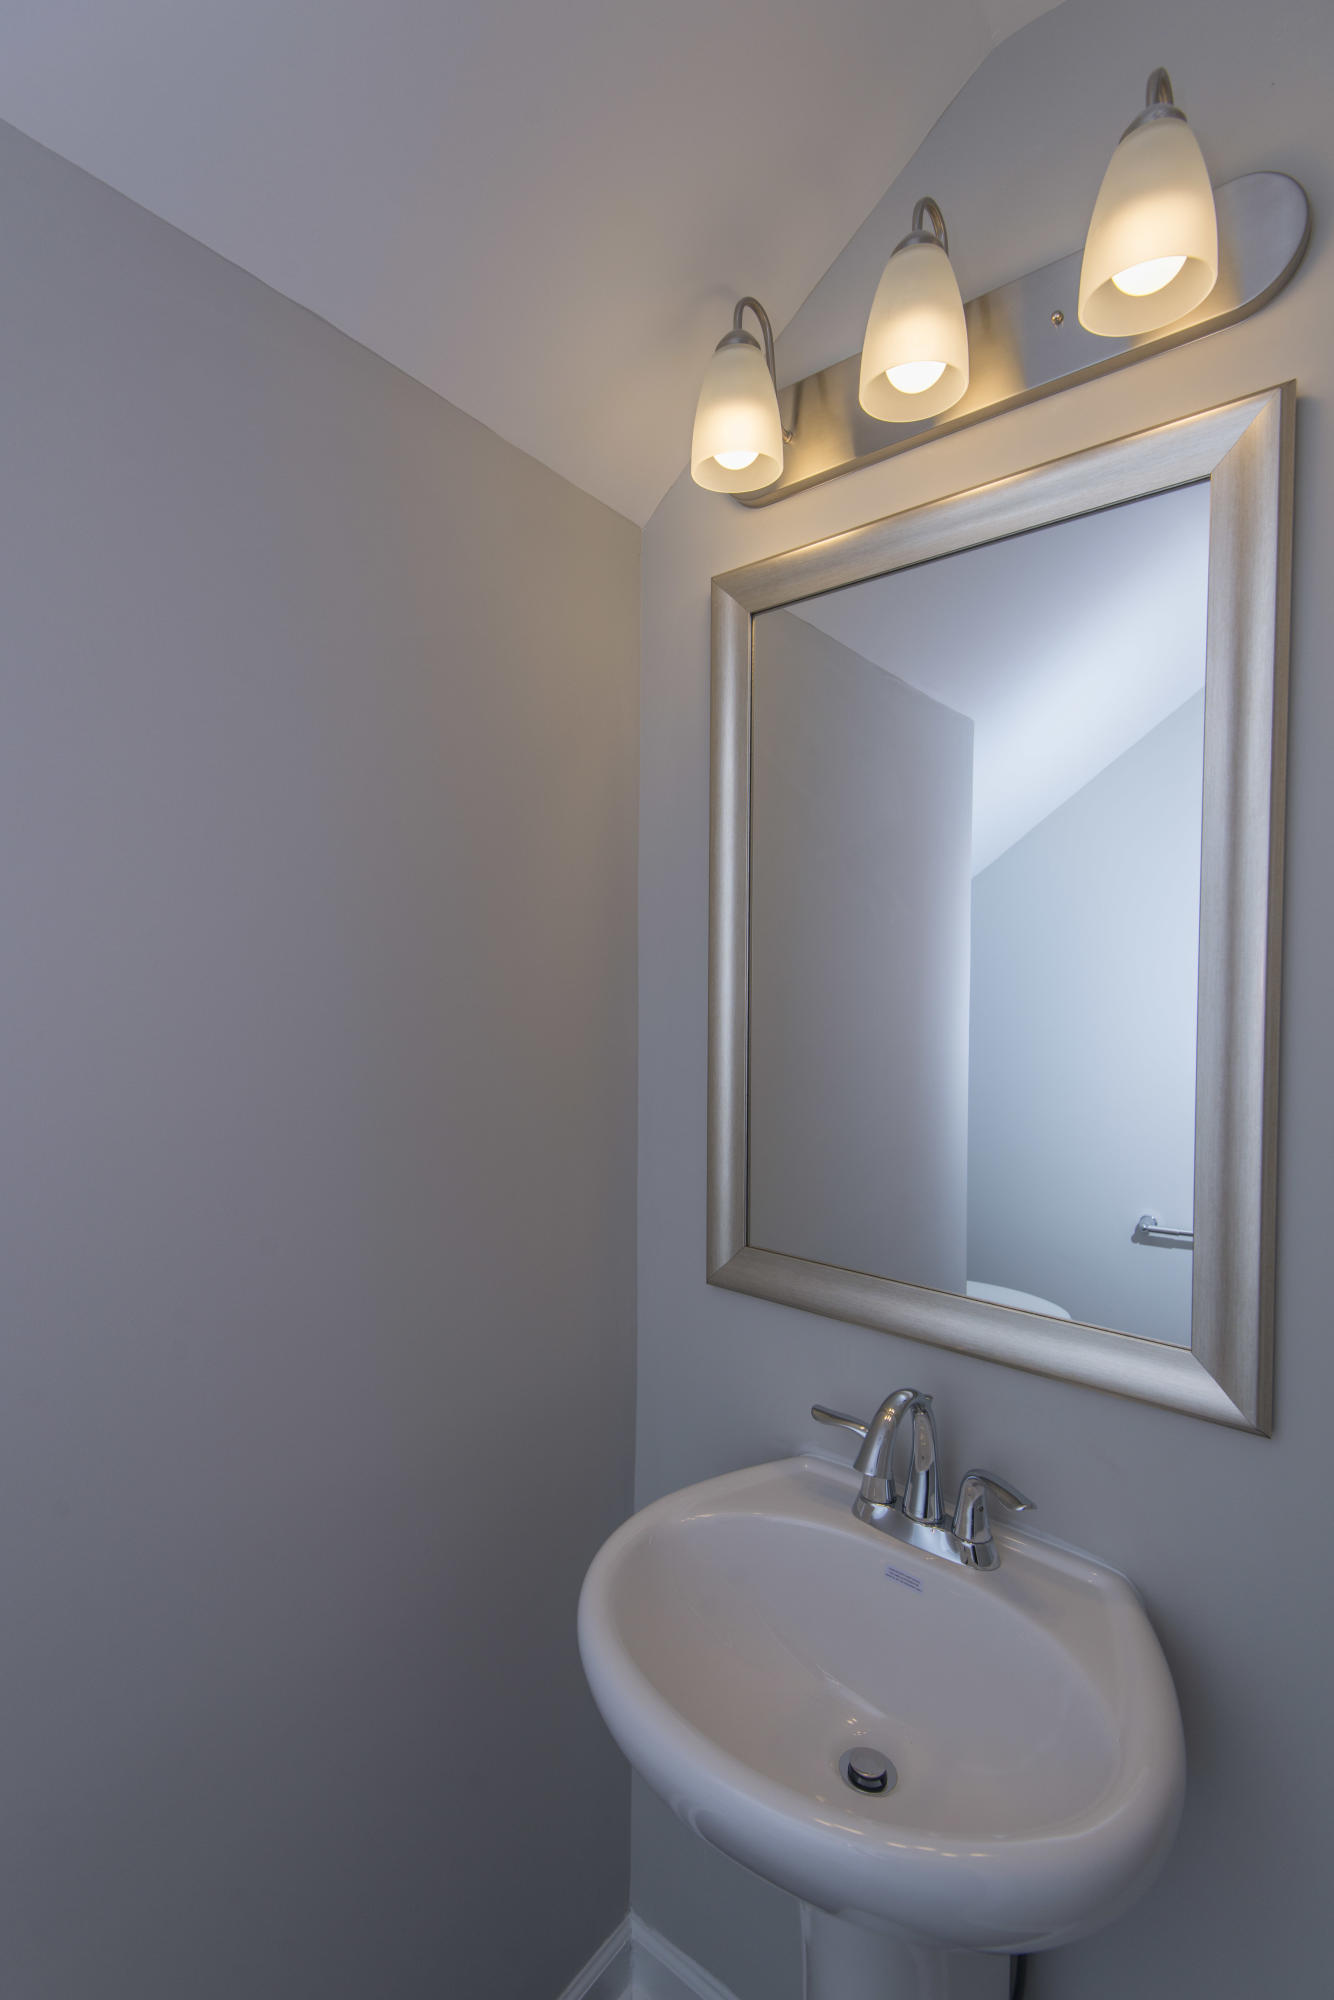 Magnolia Bluff Homes For Sale - 3120 Riverine, Charleston, SC - 50